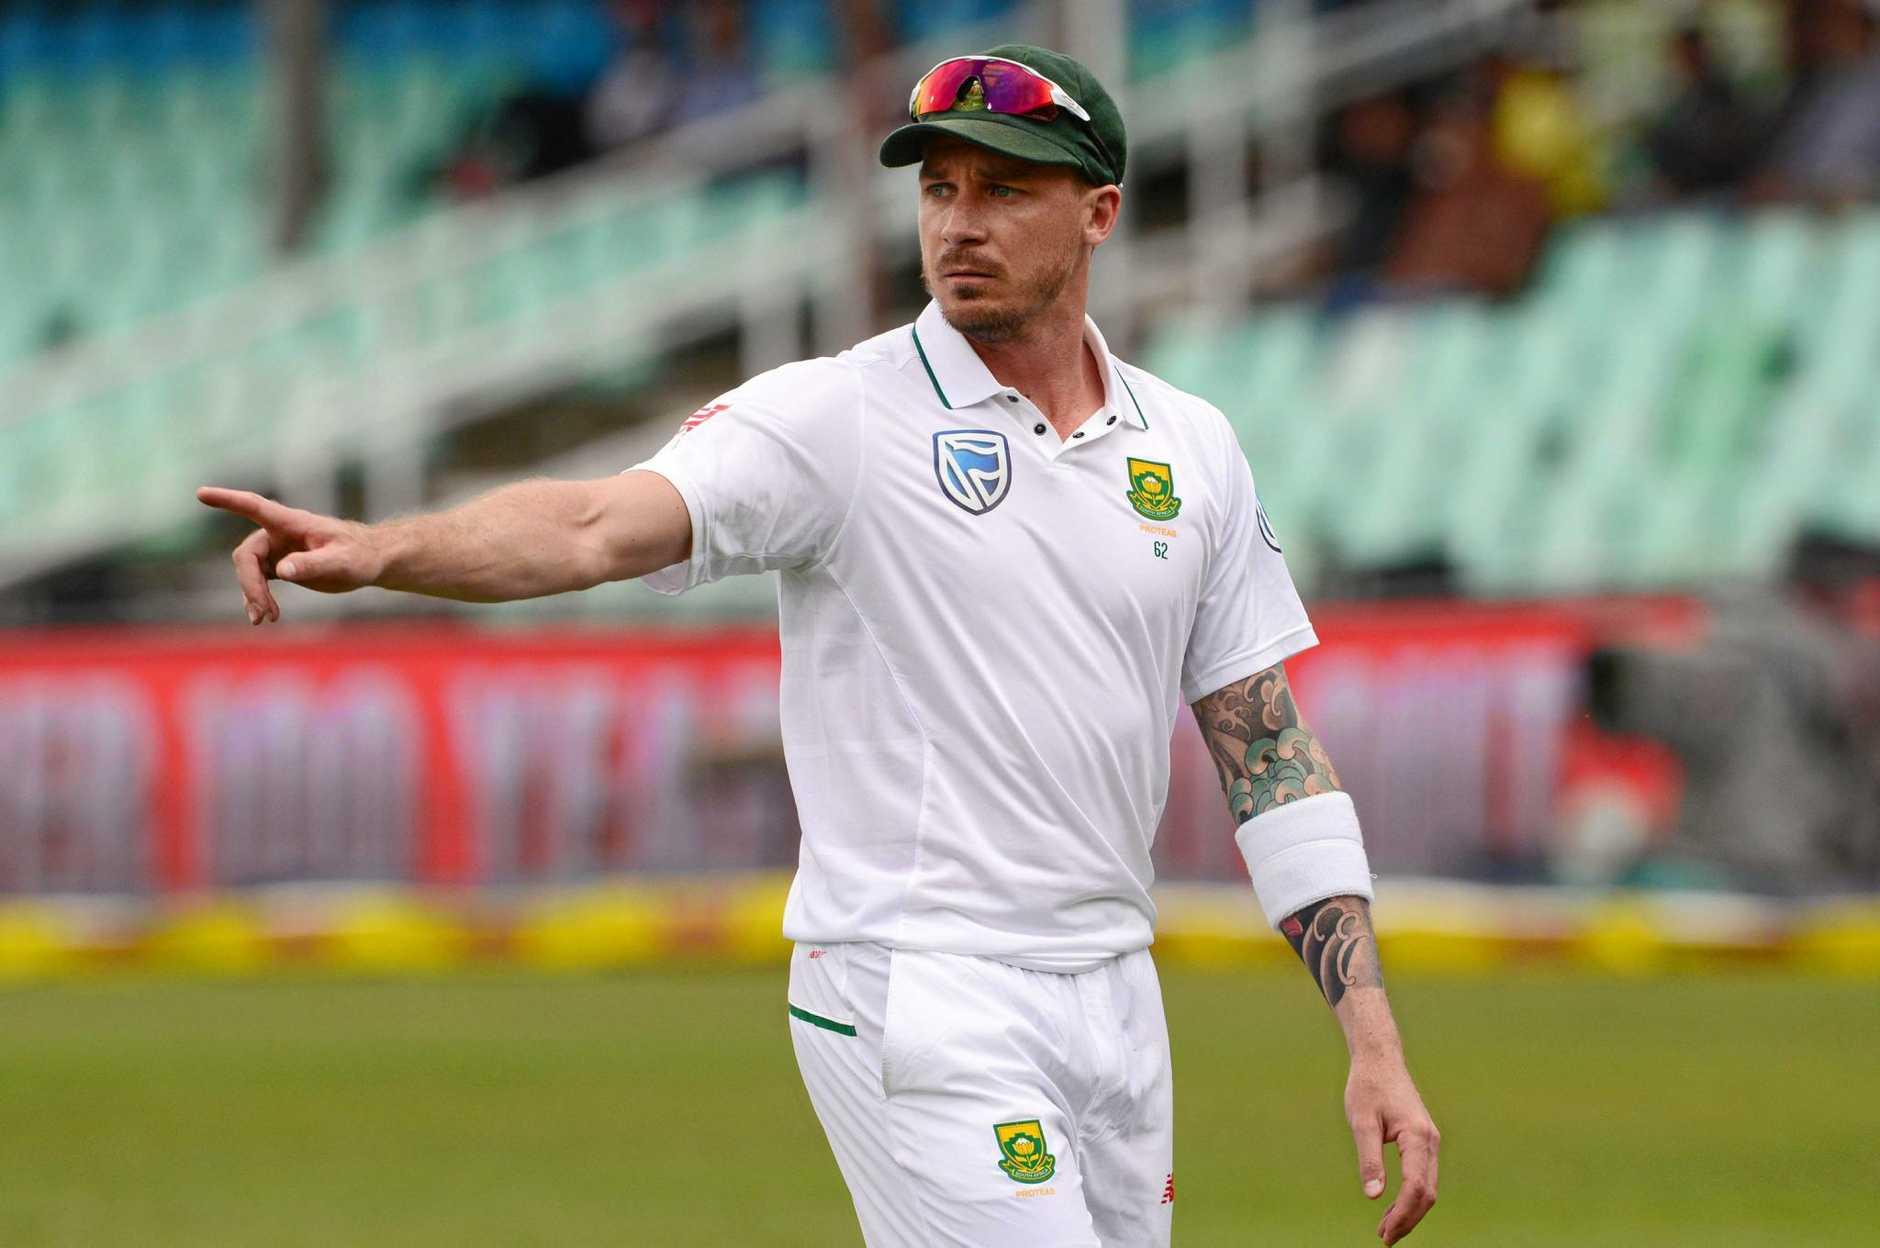 Dale Steyn will spearhead the Proteas' attack against Australia.